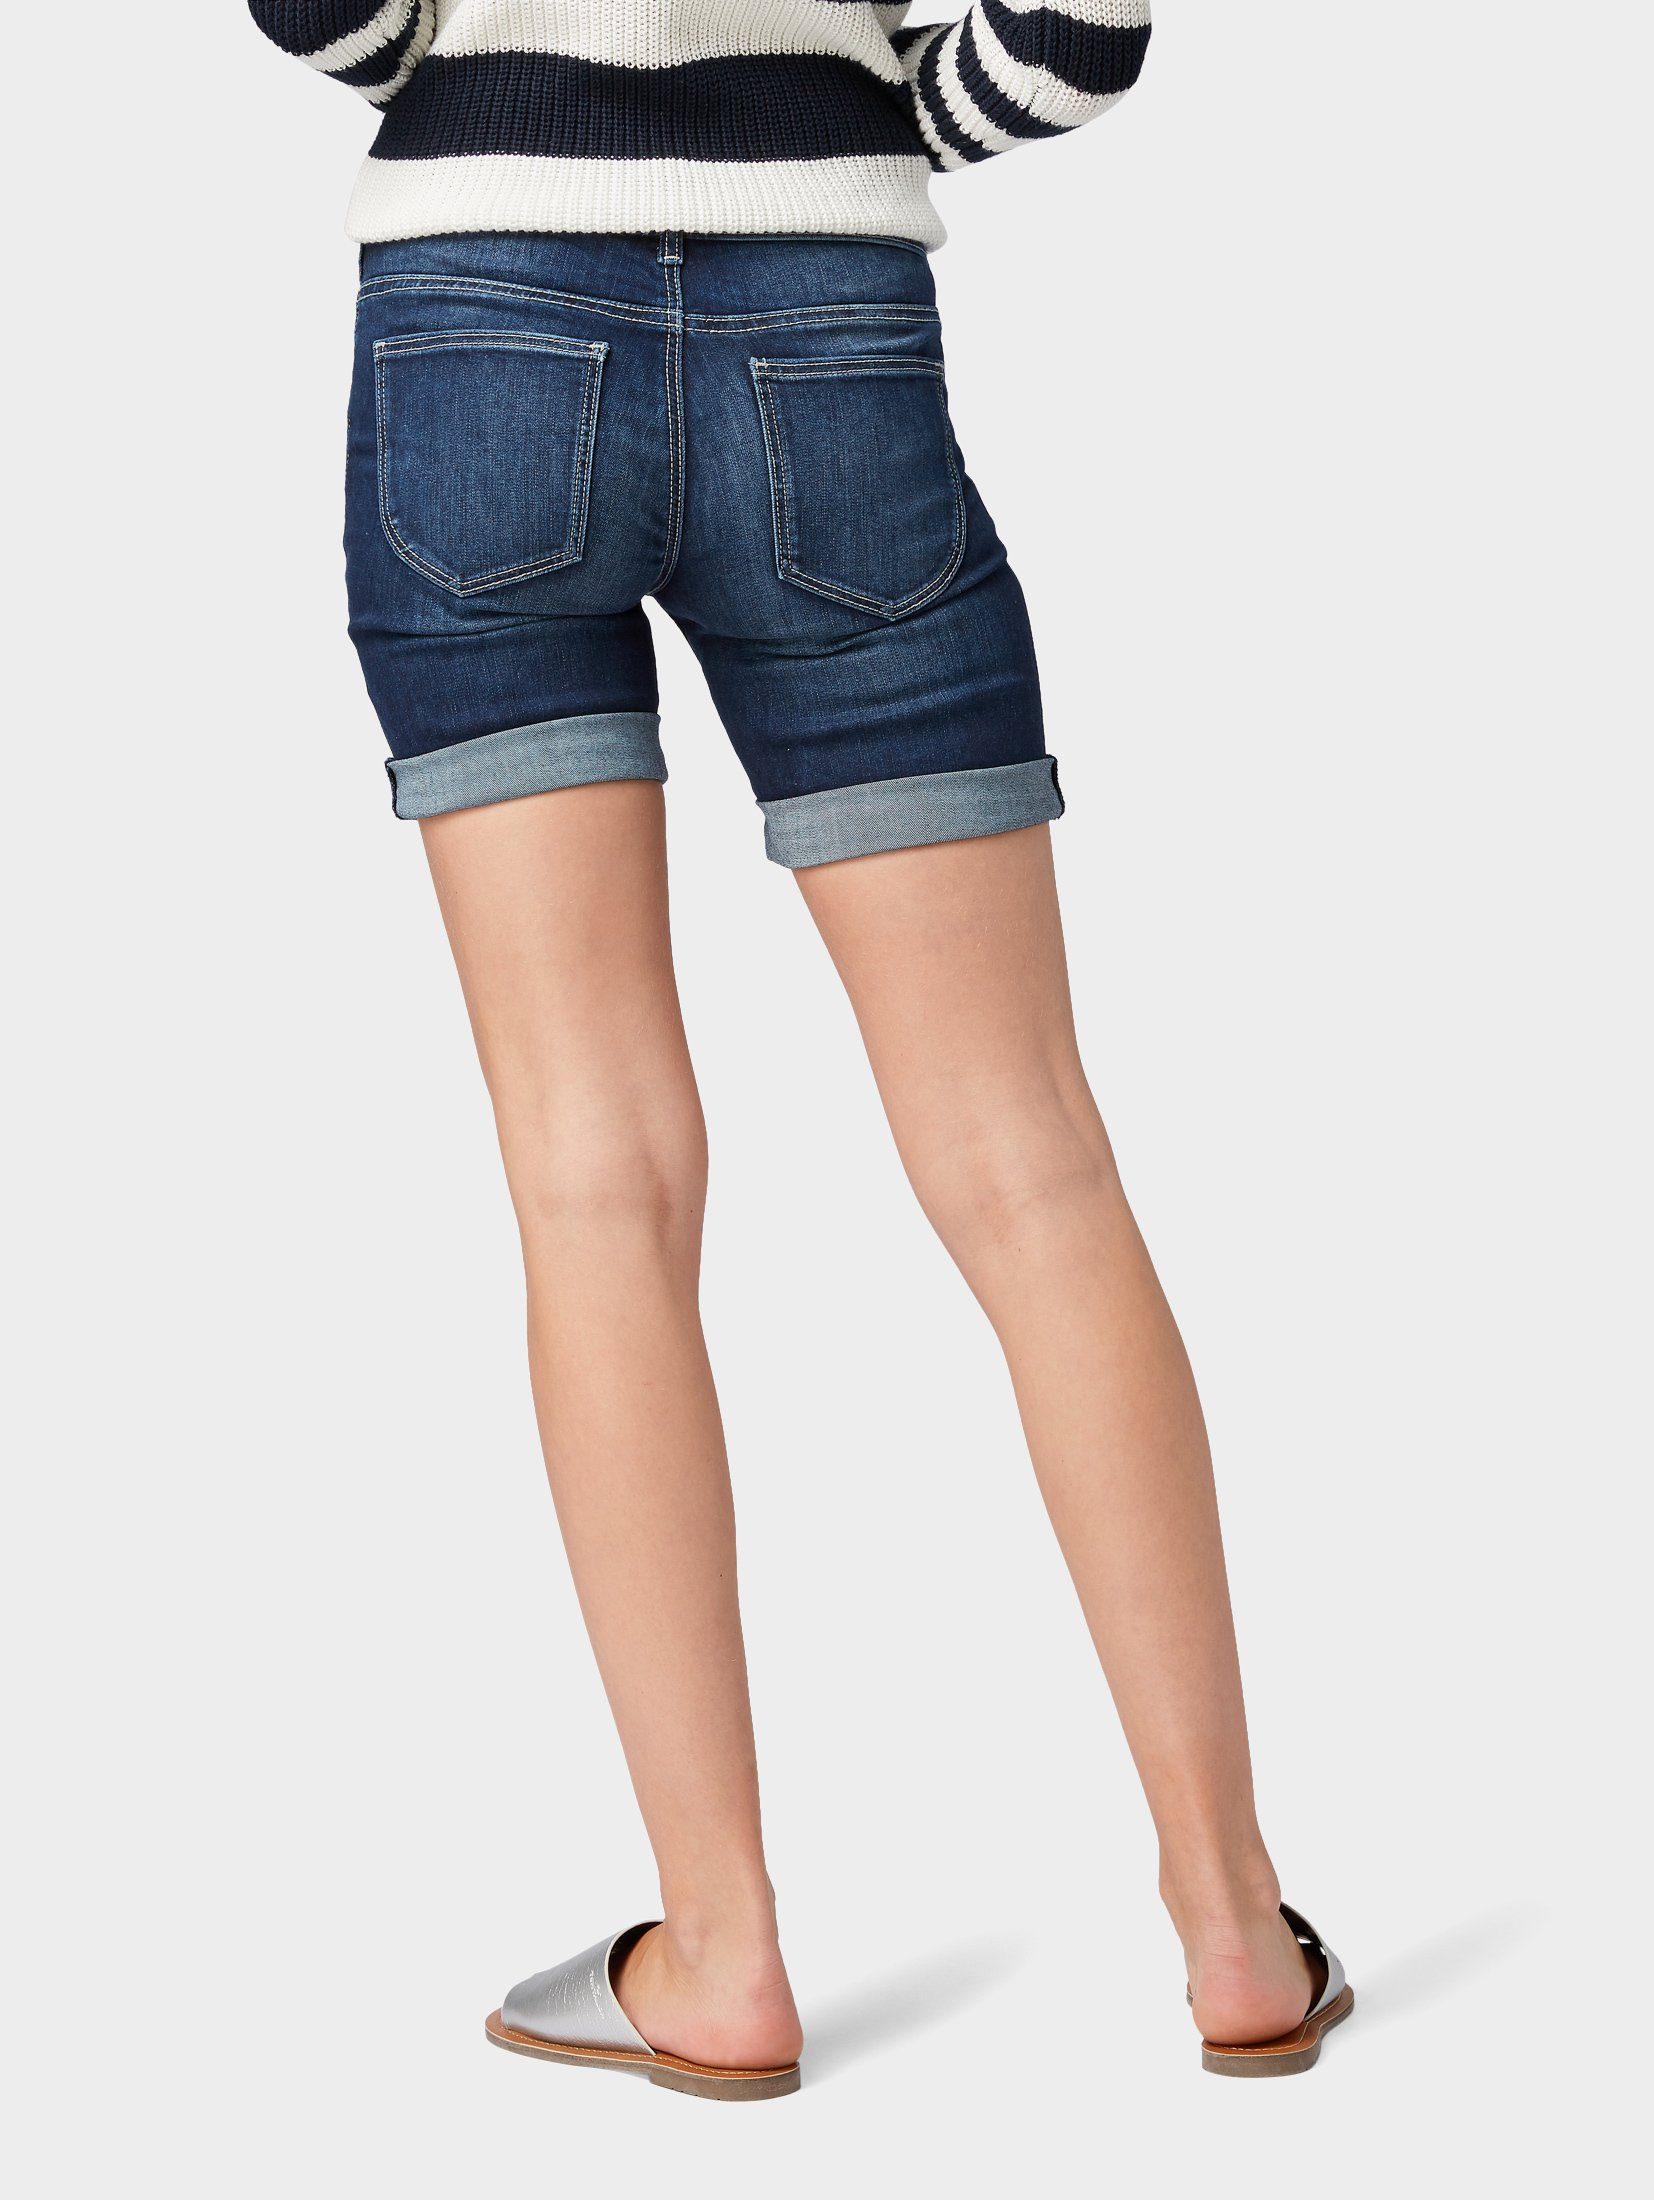 TOM TAILOR Jeansshorts »Alexa Bermuda Hose« kaufen | OTTO